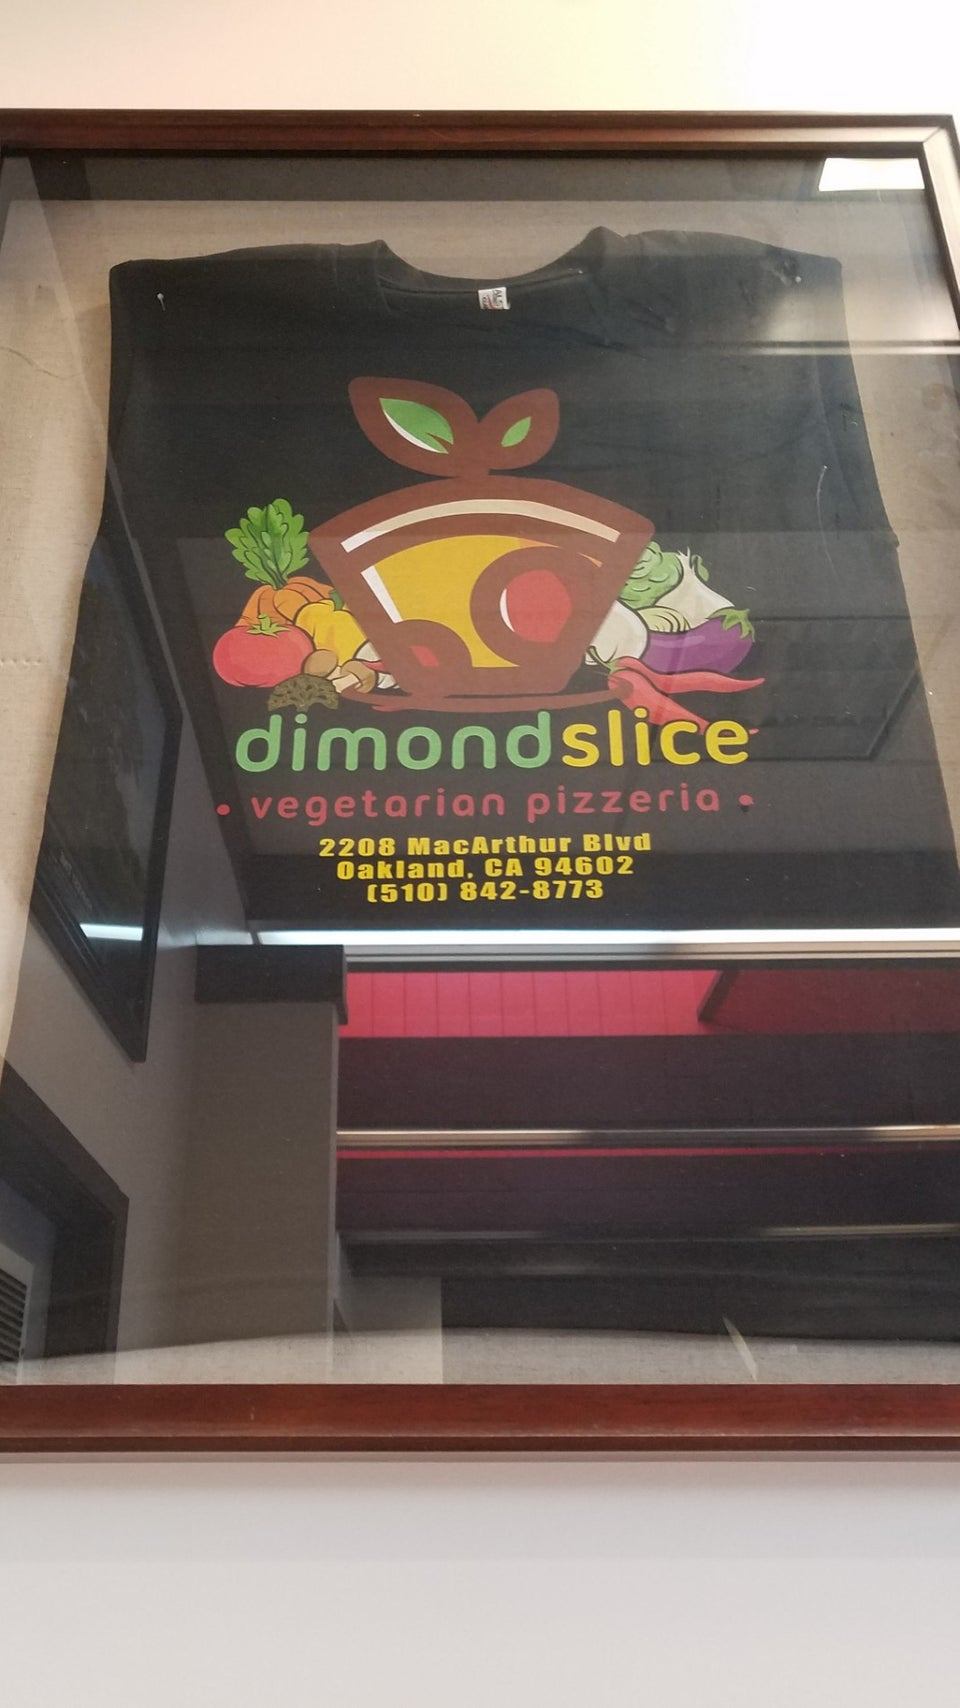 Dimond Slice Pizza 2208 MacArthur Blvd, Oakland